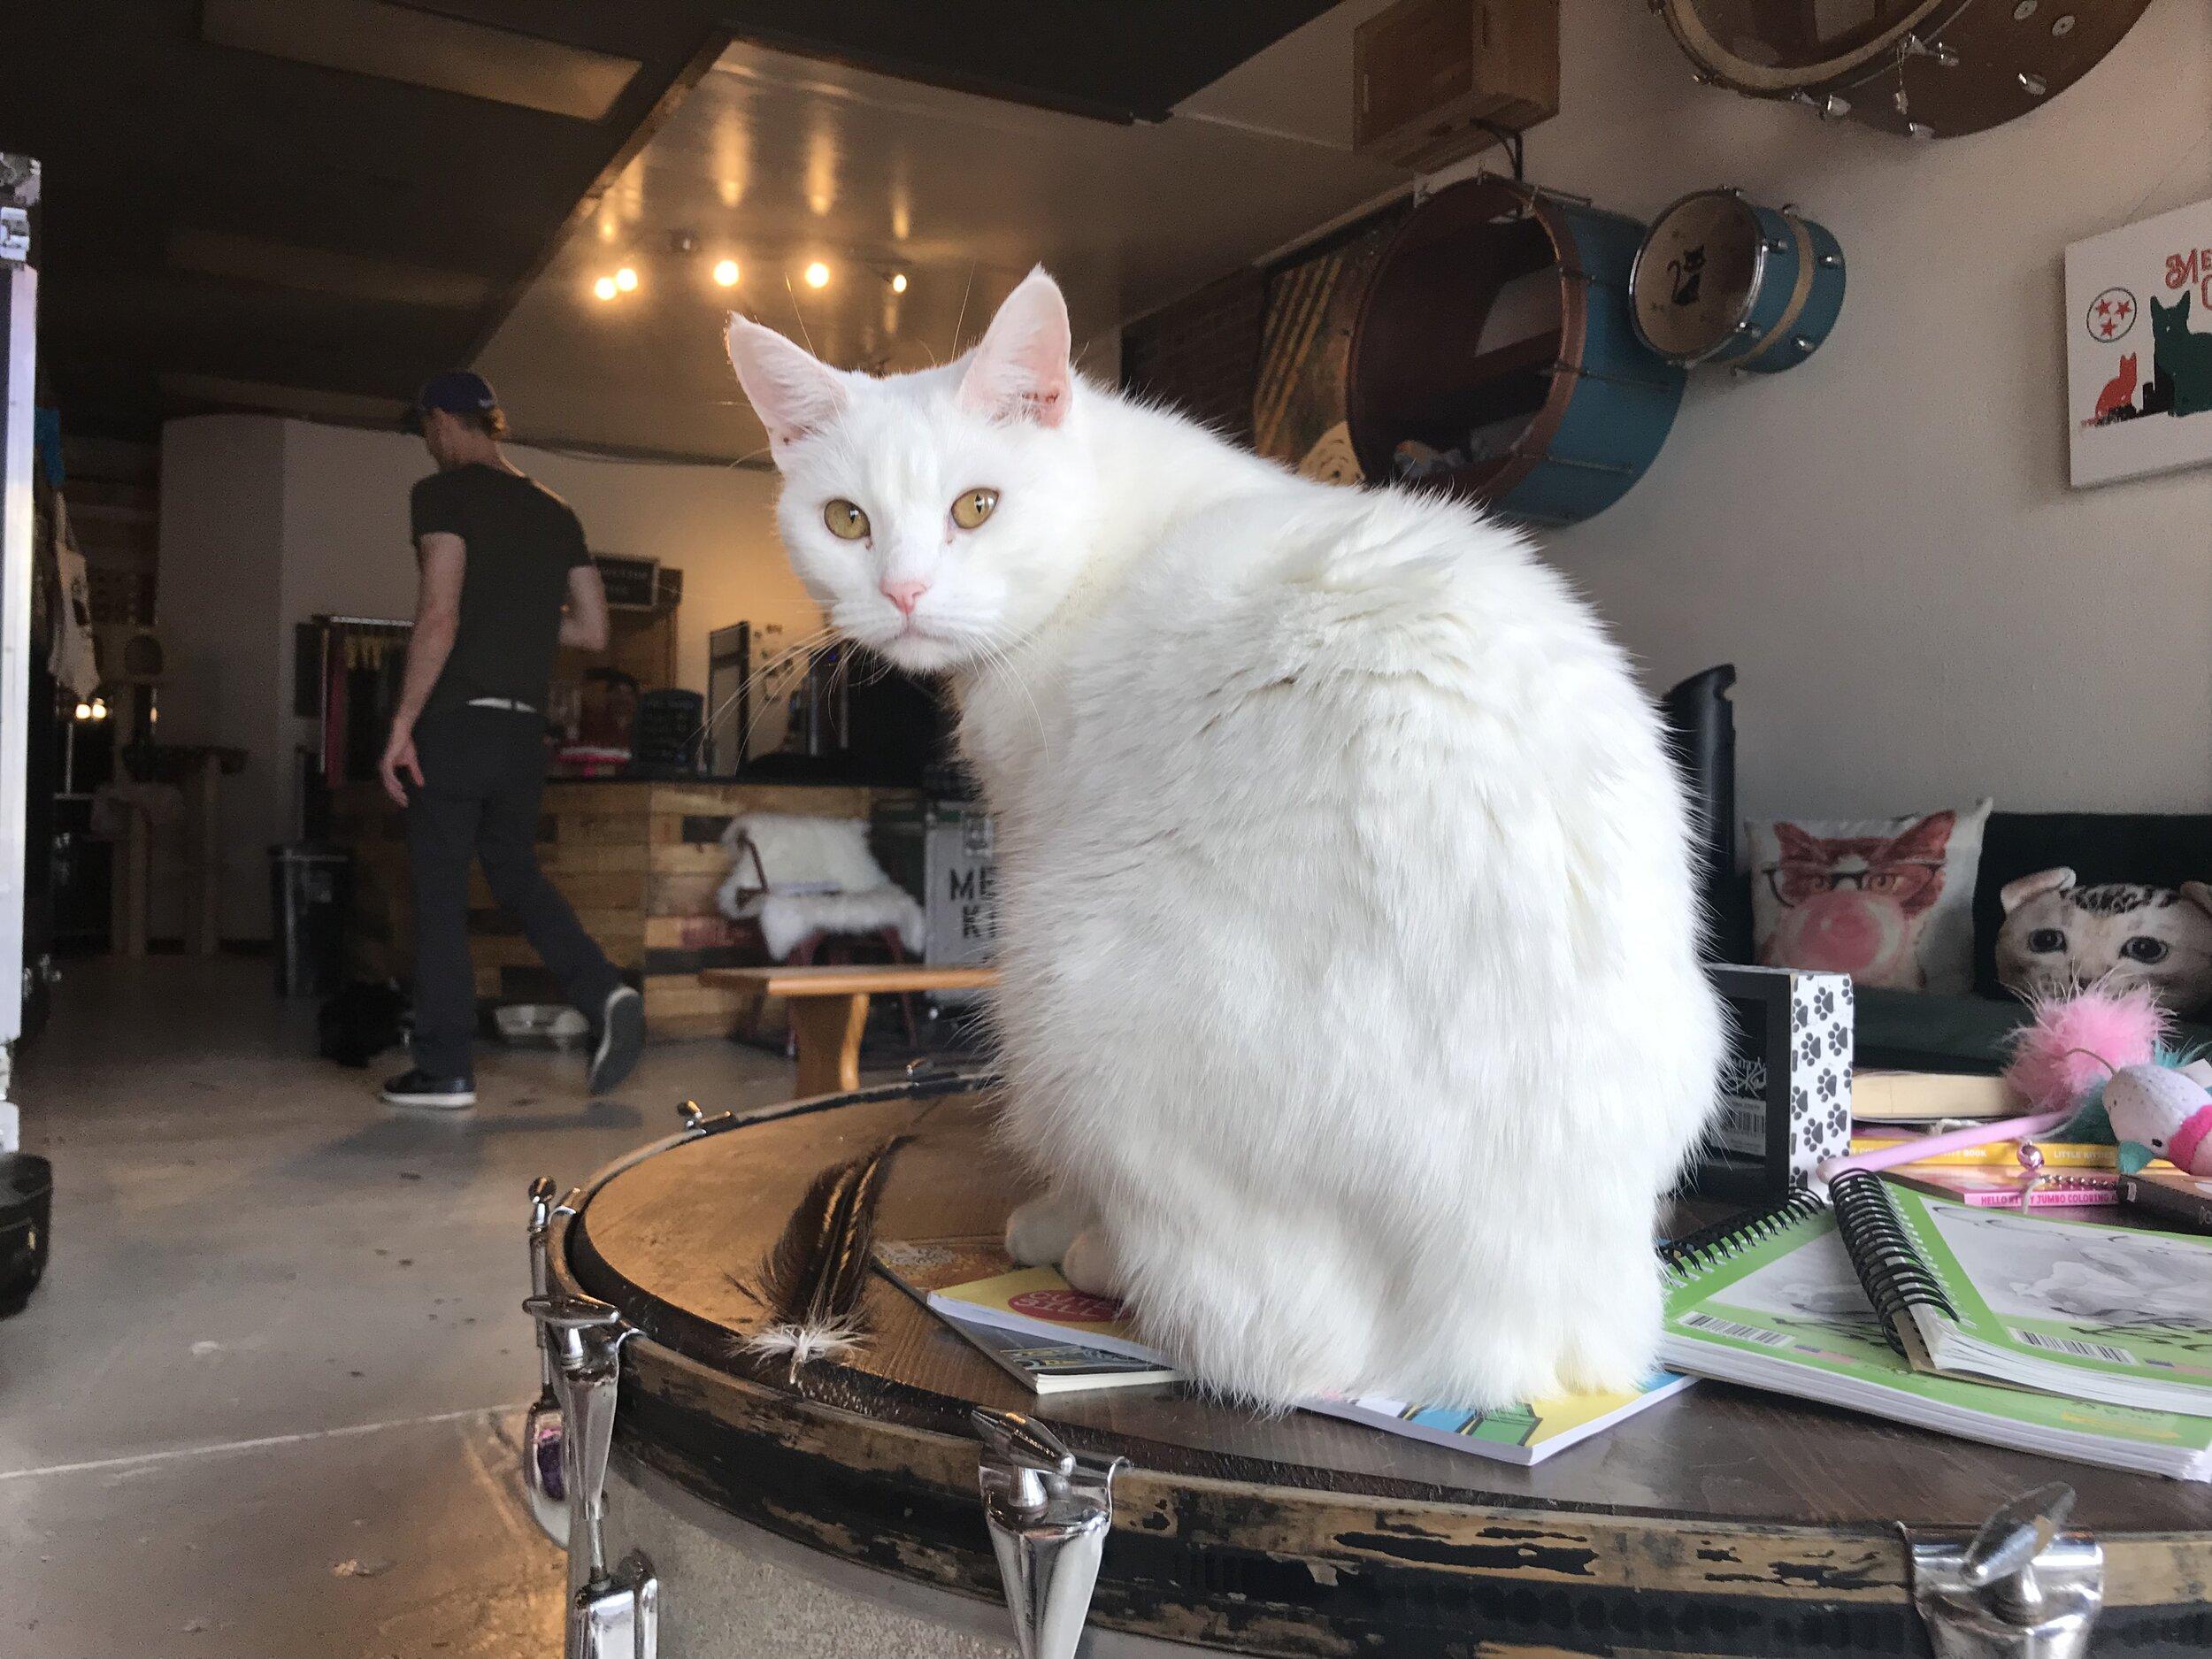 Mewsic Kitty-38.jpg